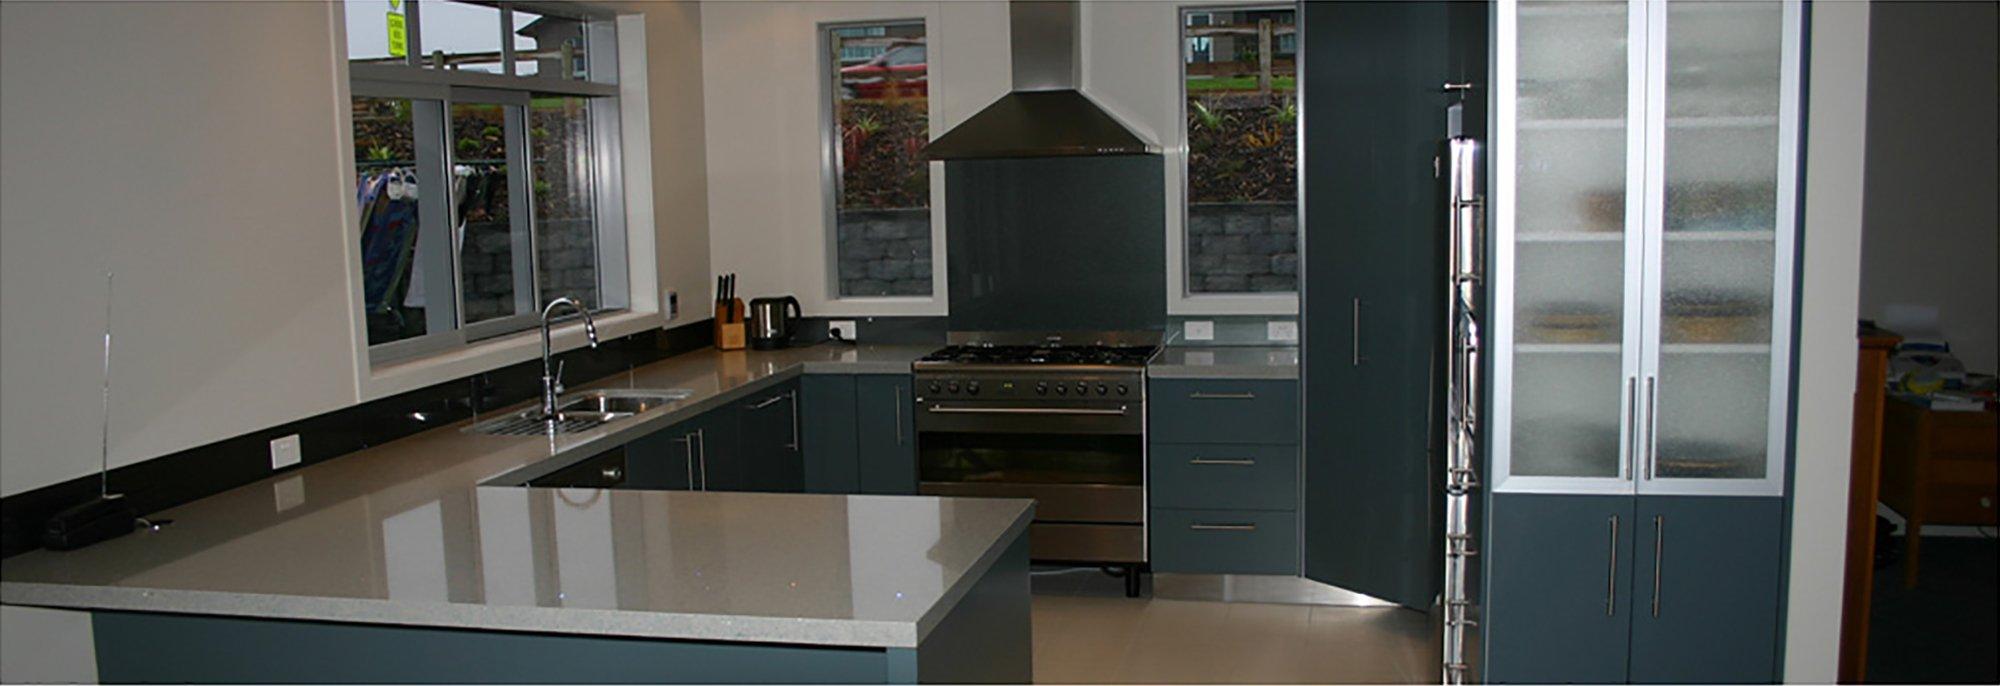 Custom furniture designed for the kitchen